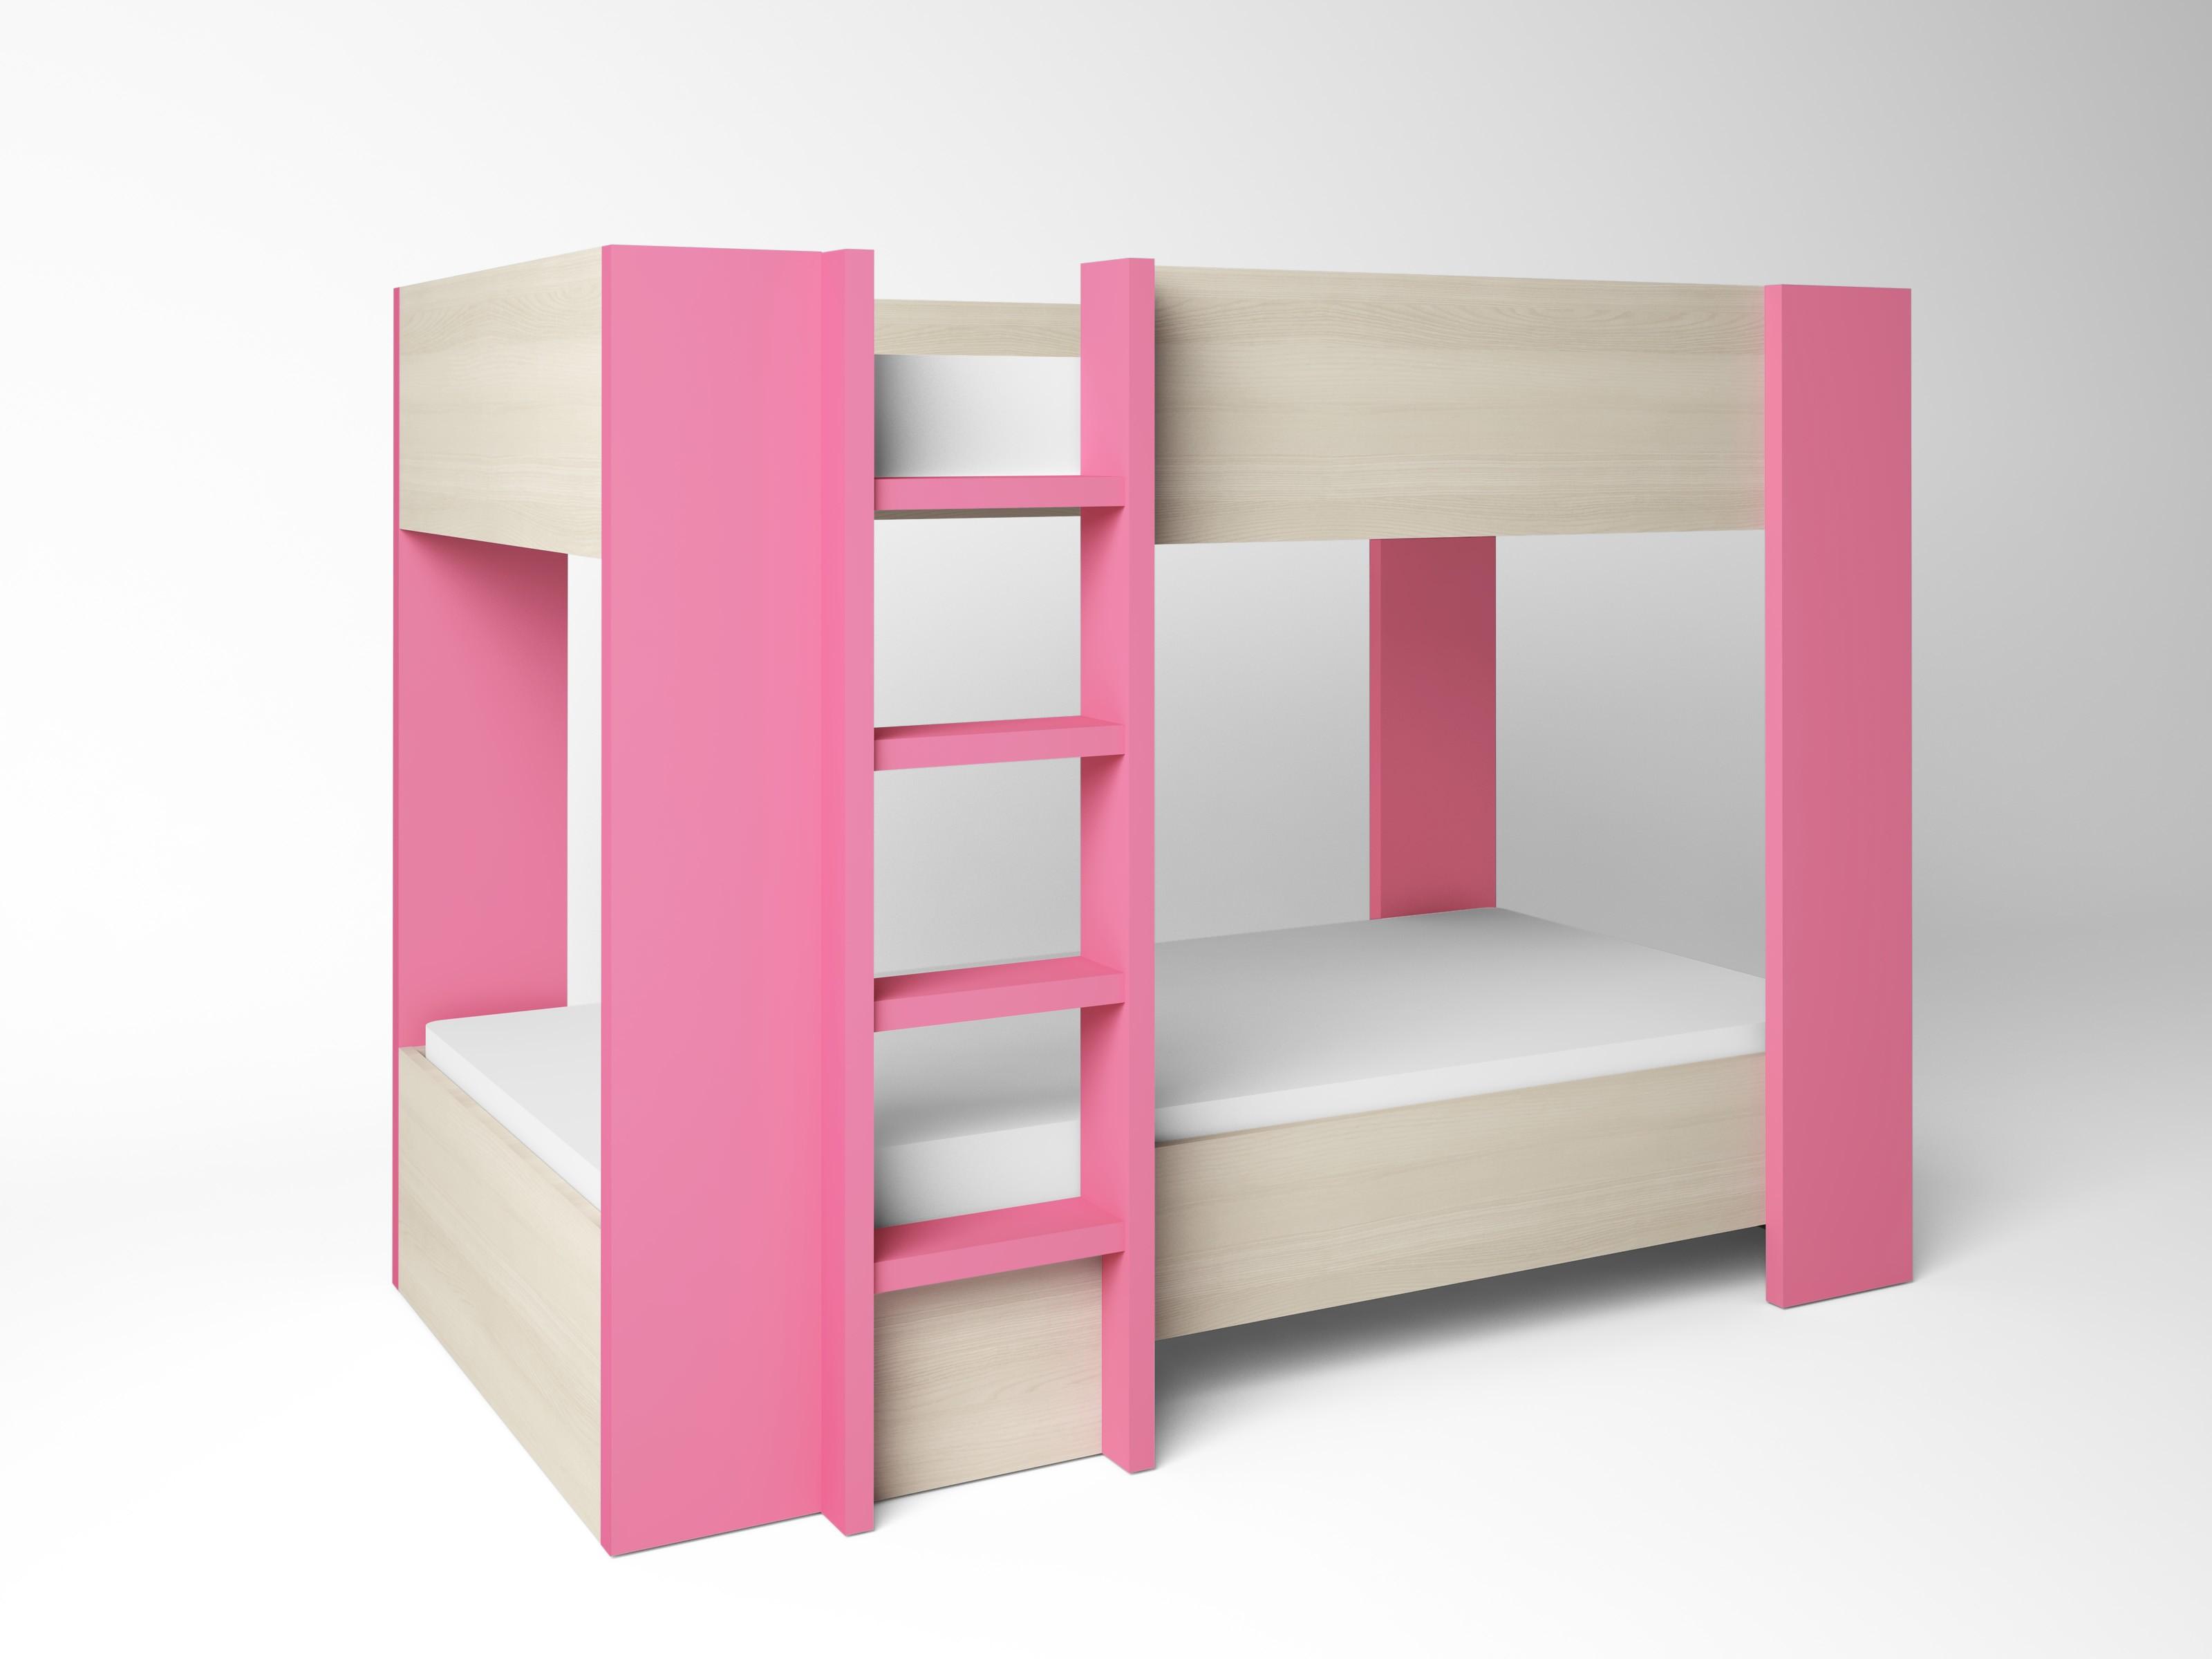 Conforama literas infantiles 36024 muebles ideas - Camas de ninos conforama ...